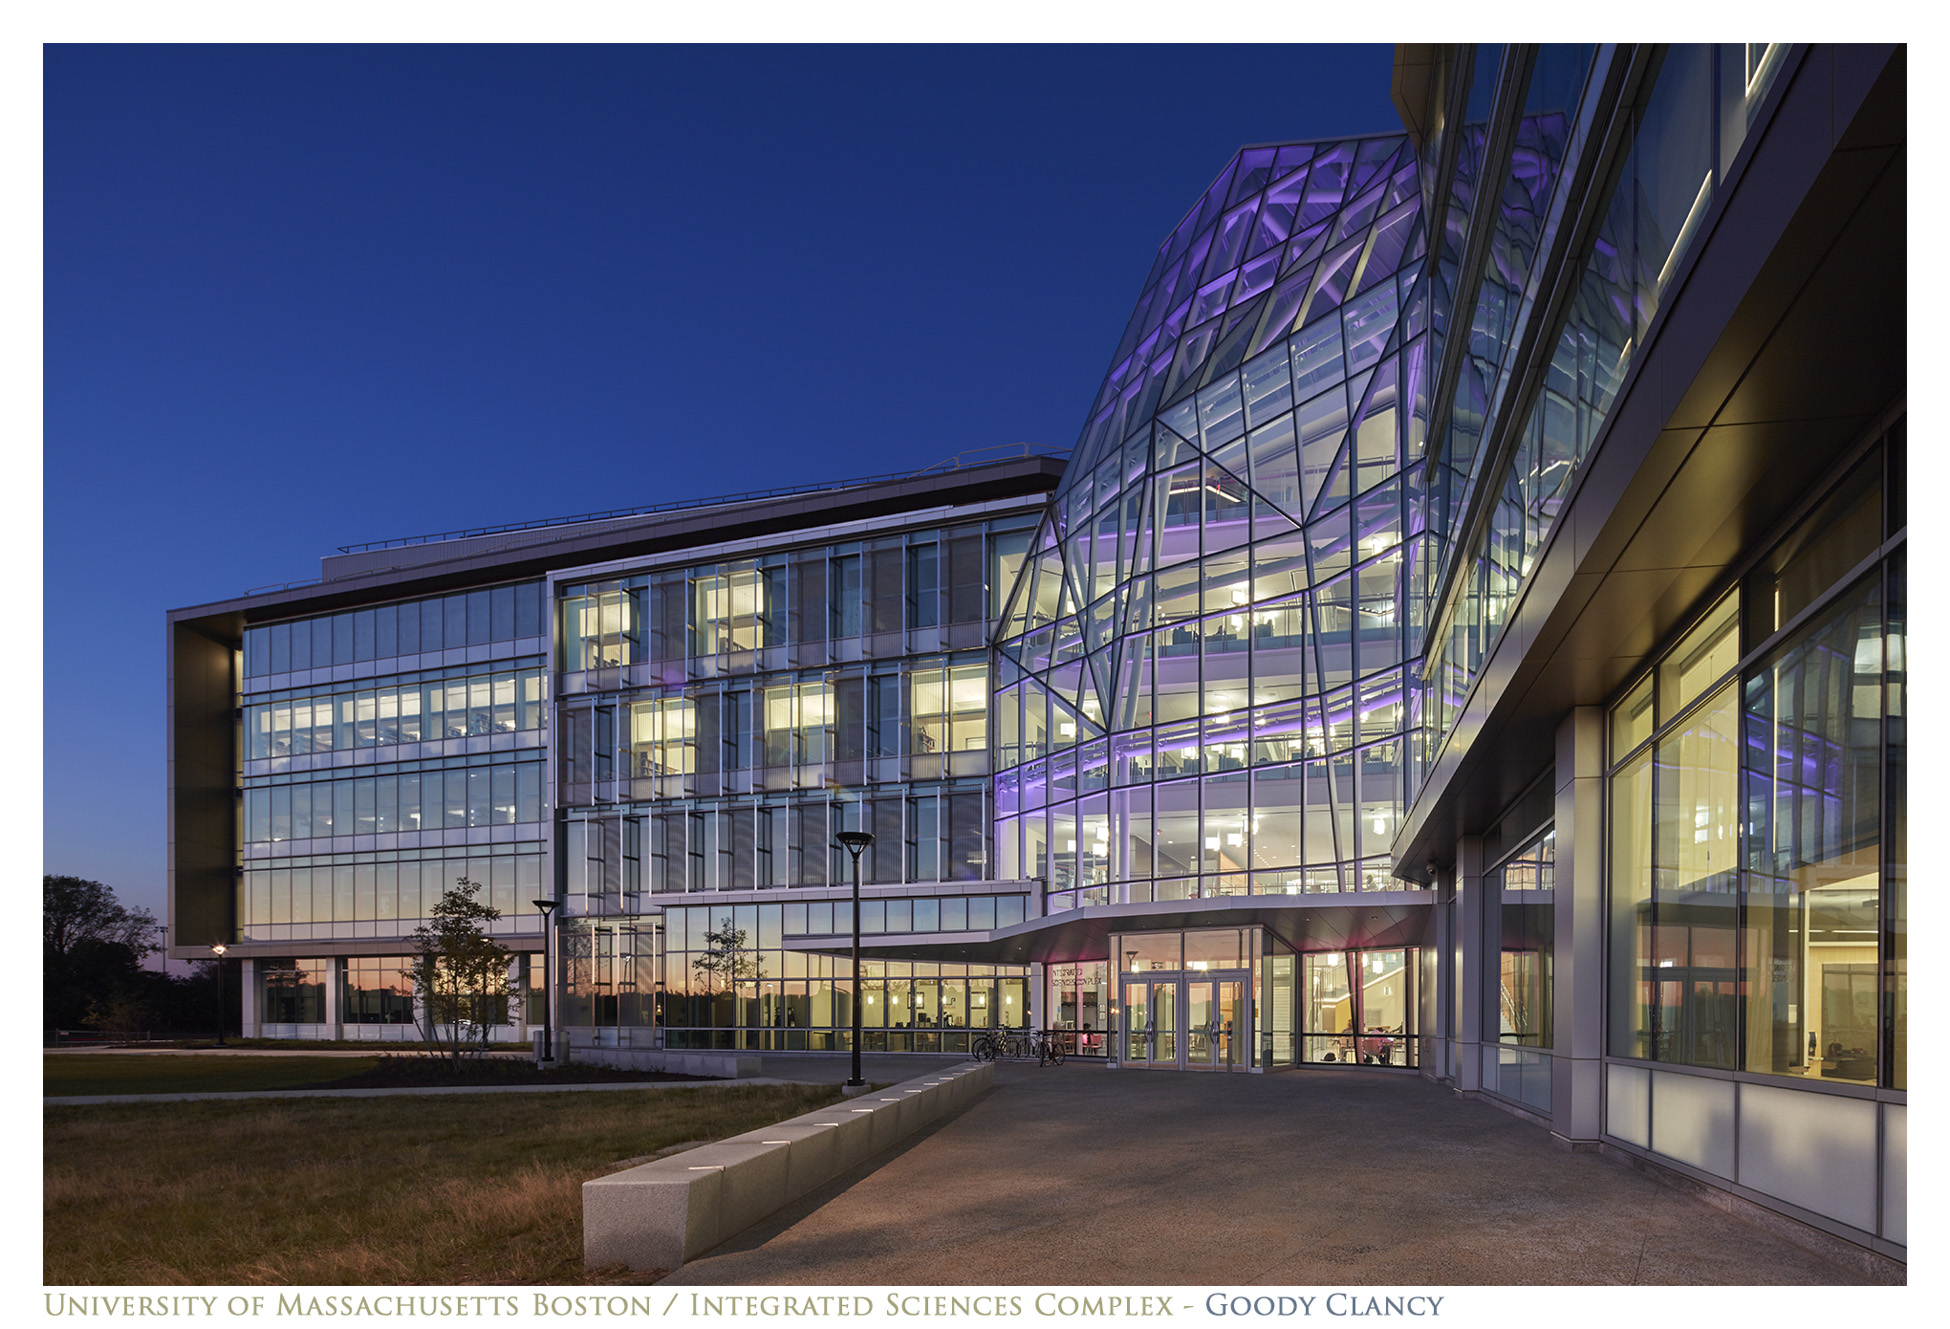 001_Robert-Benson-Photography-Goody-Clancy-University-Massachusetts-Boston-Integrated-Science-Center-44.jpg